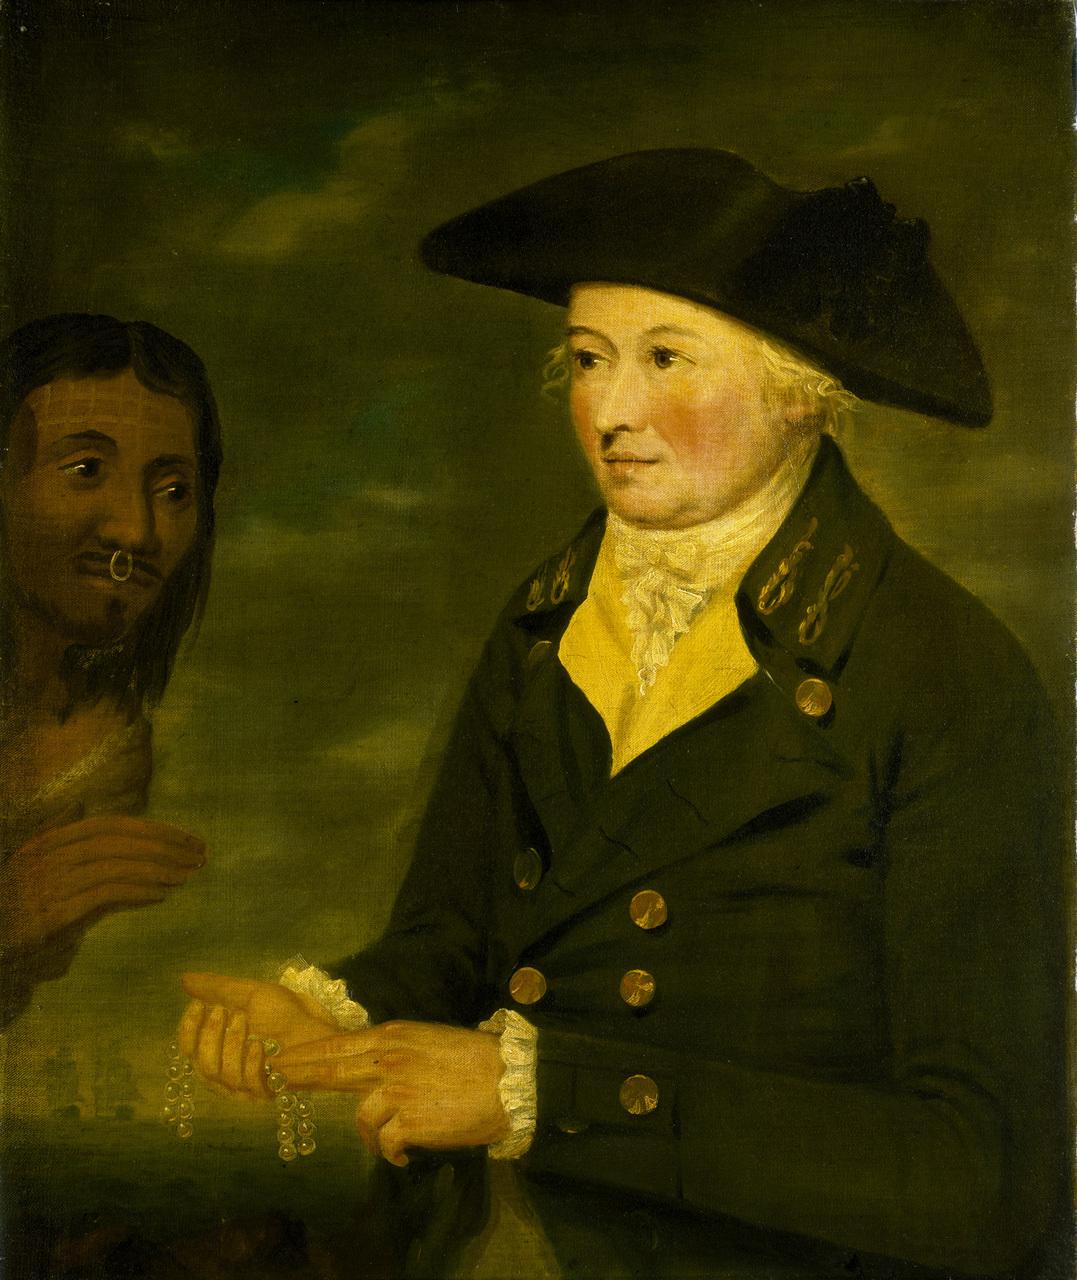 Captain Nathaniel Portlock (c. 1747-1817)